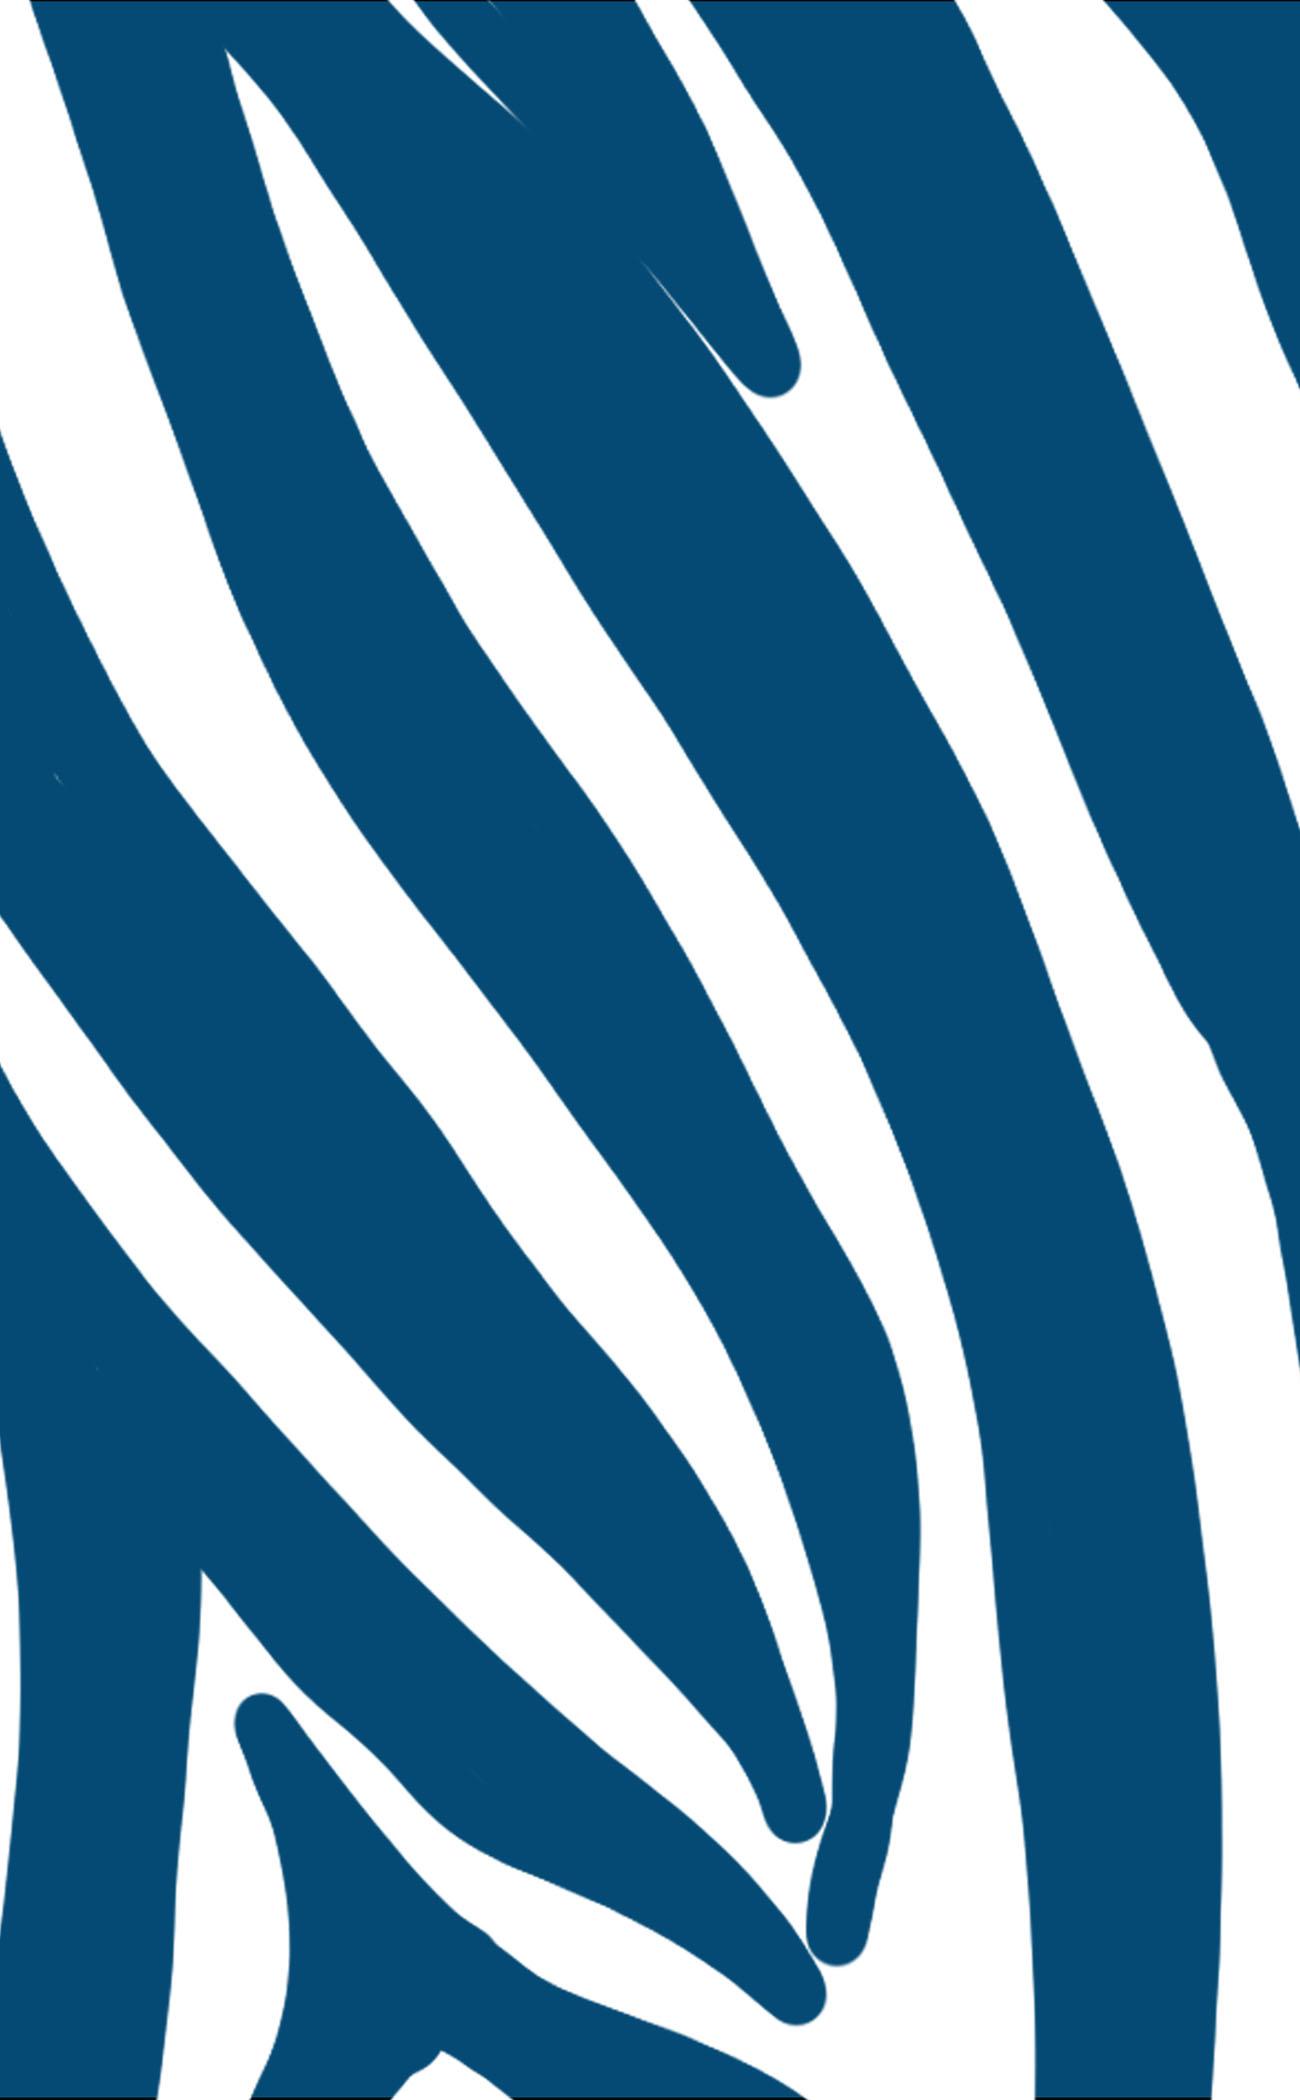 zebrastripebluephone.jpg